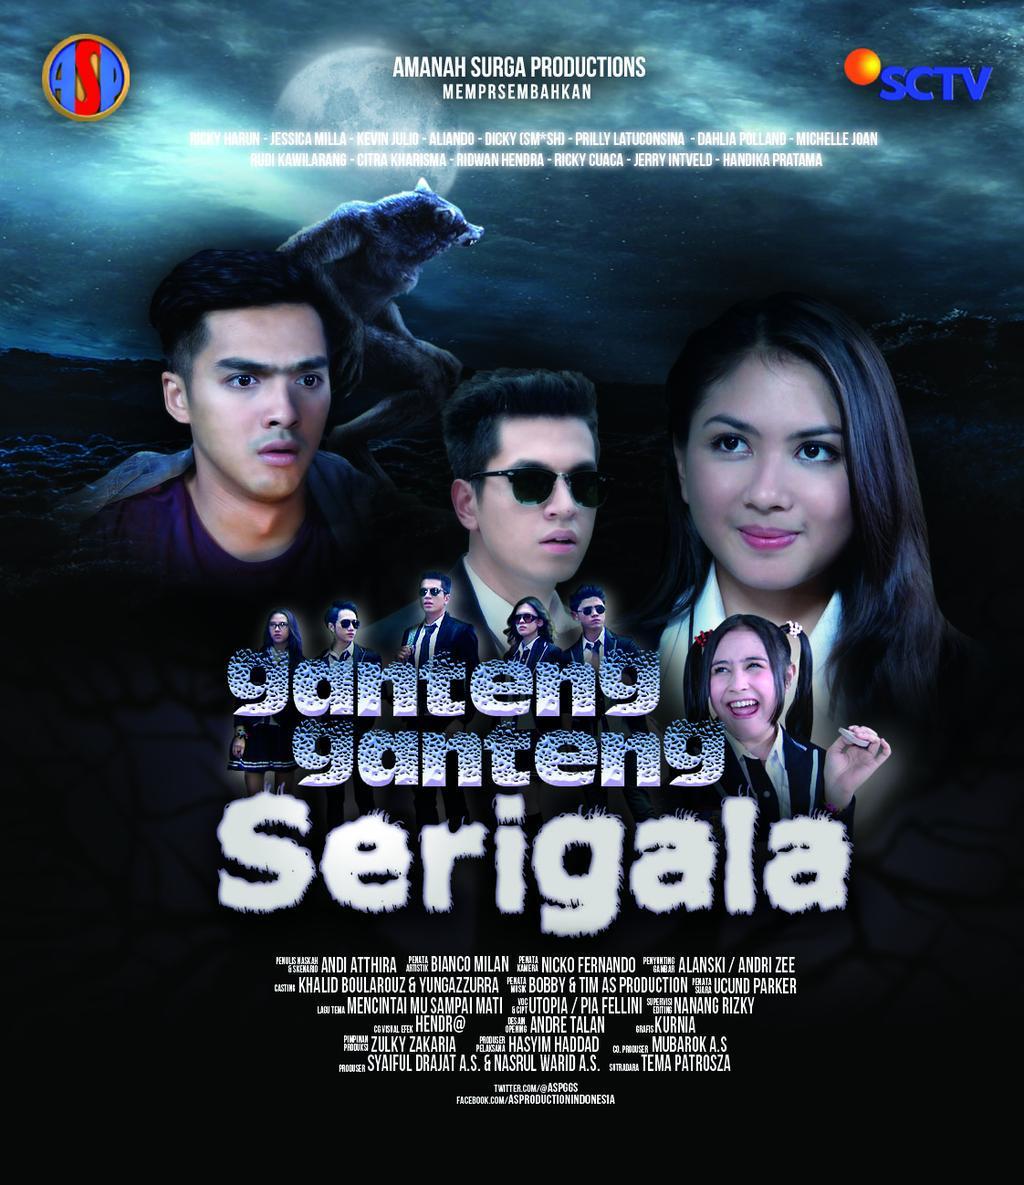 "Sctv: SCTV On Twitter: ""Nantikan #GantengGantengSerigala Cast"